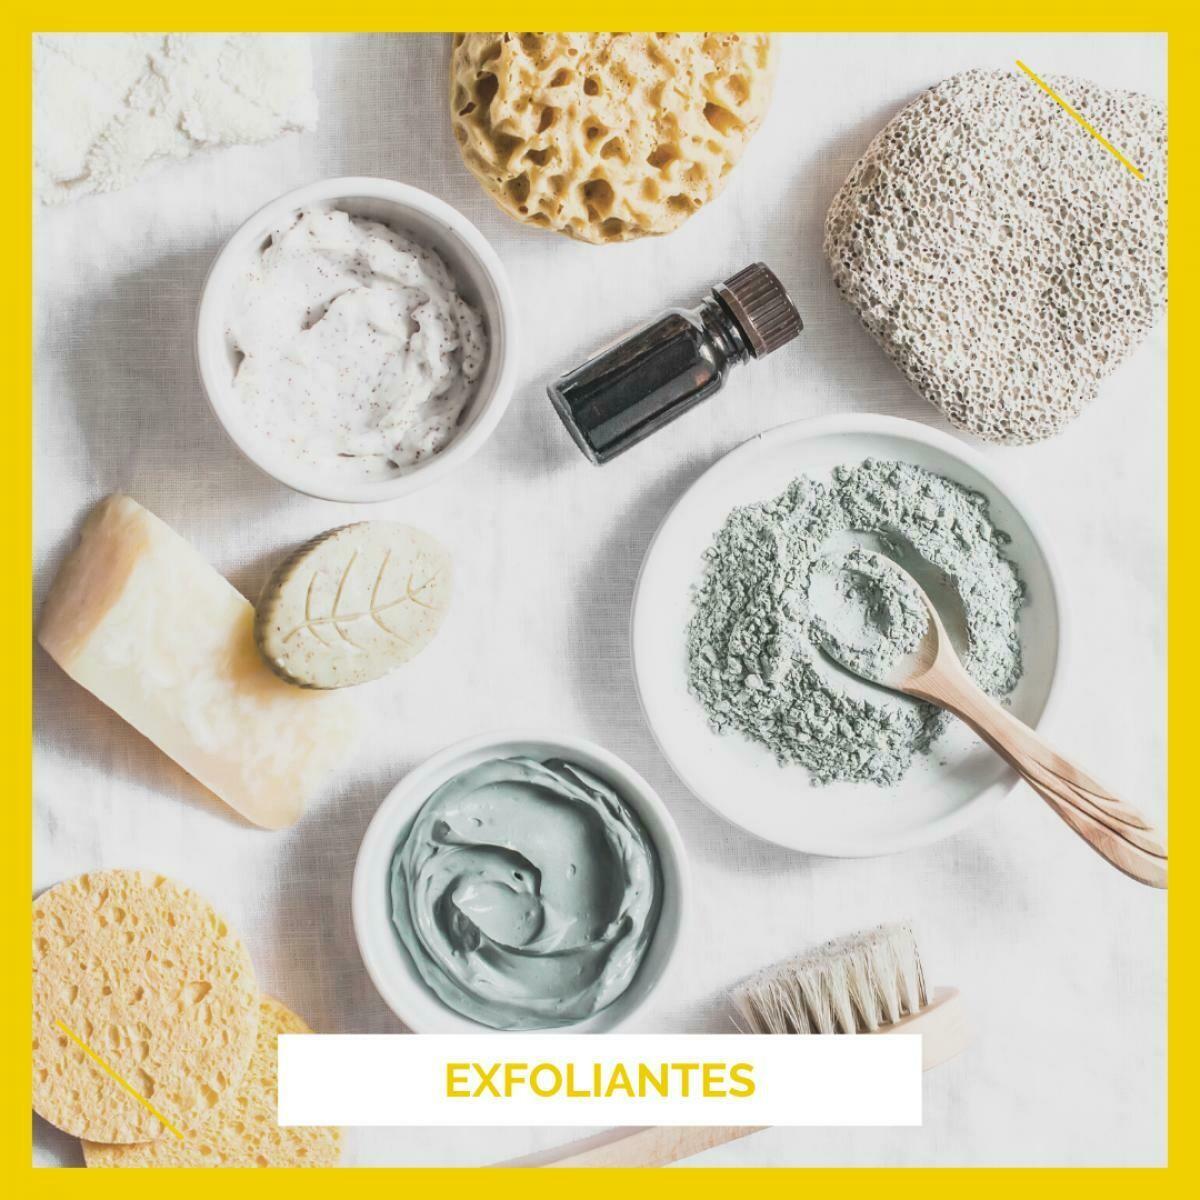 Higiene, exfoliantes y mascarillas